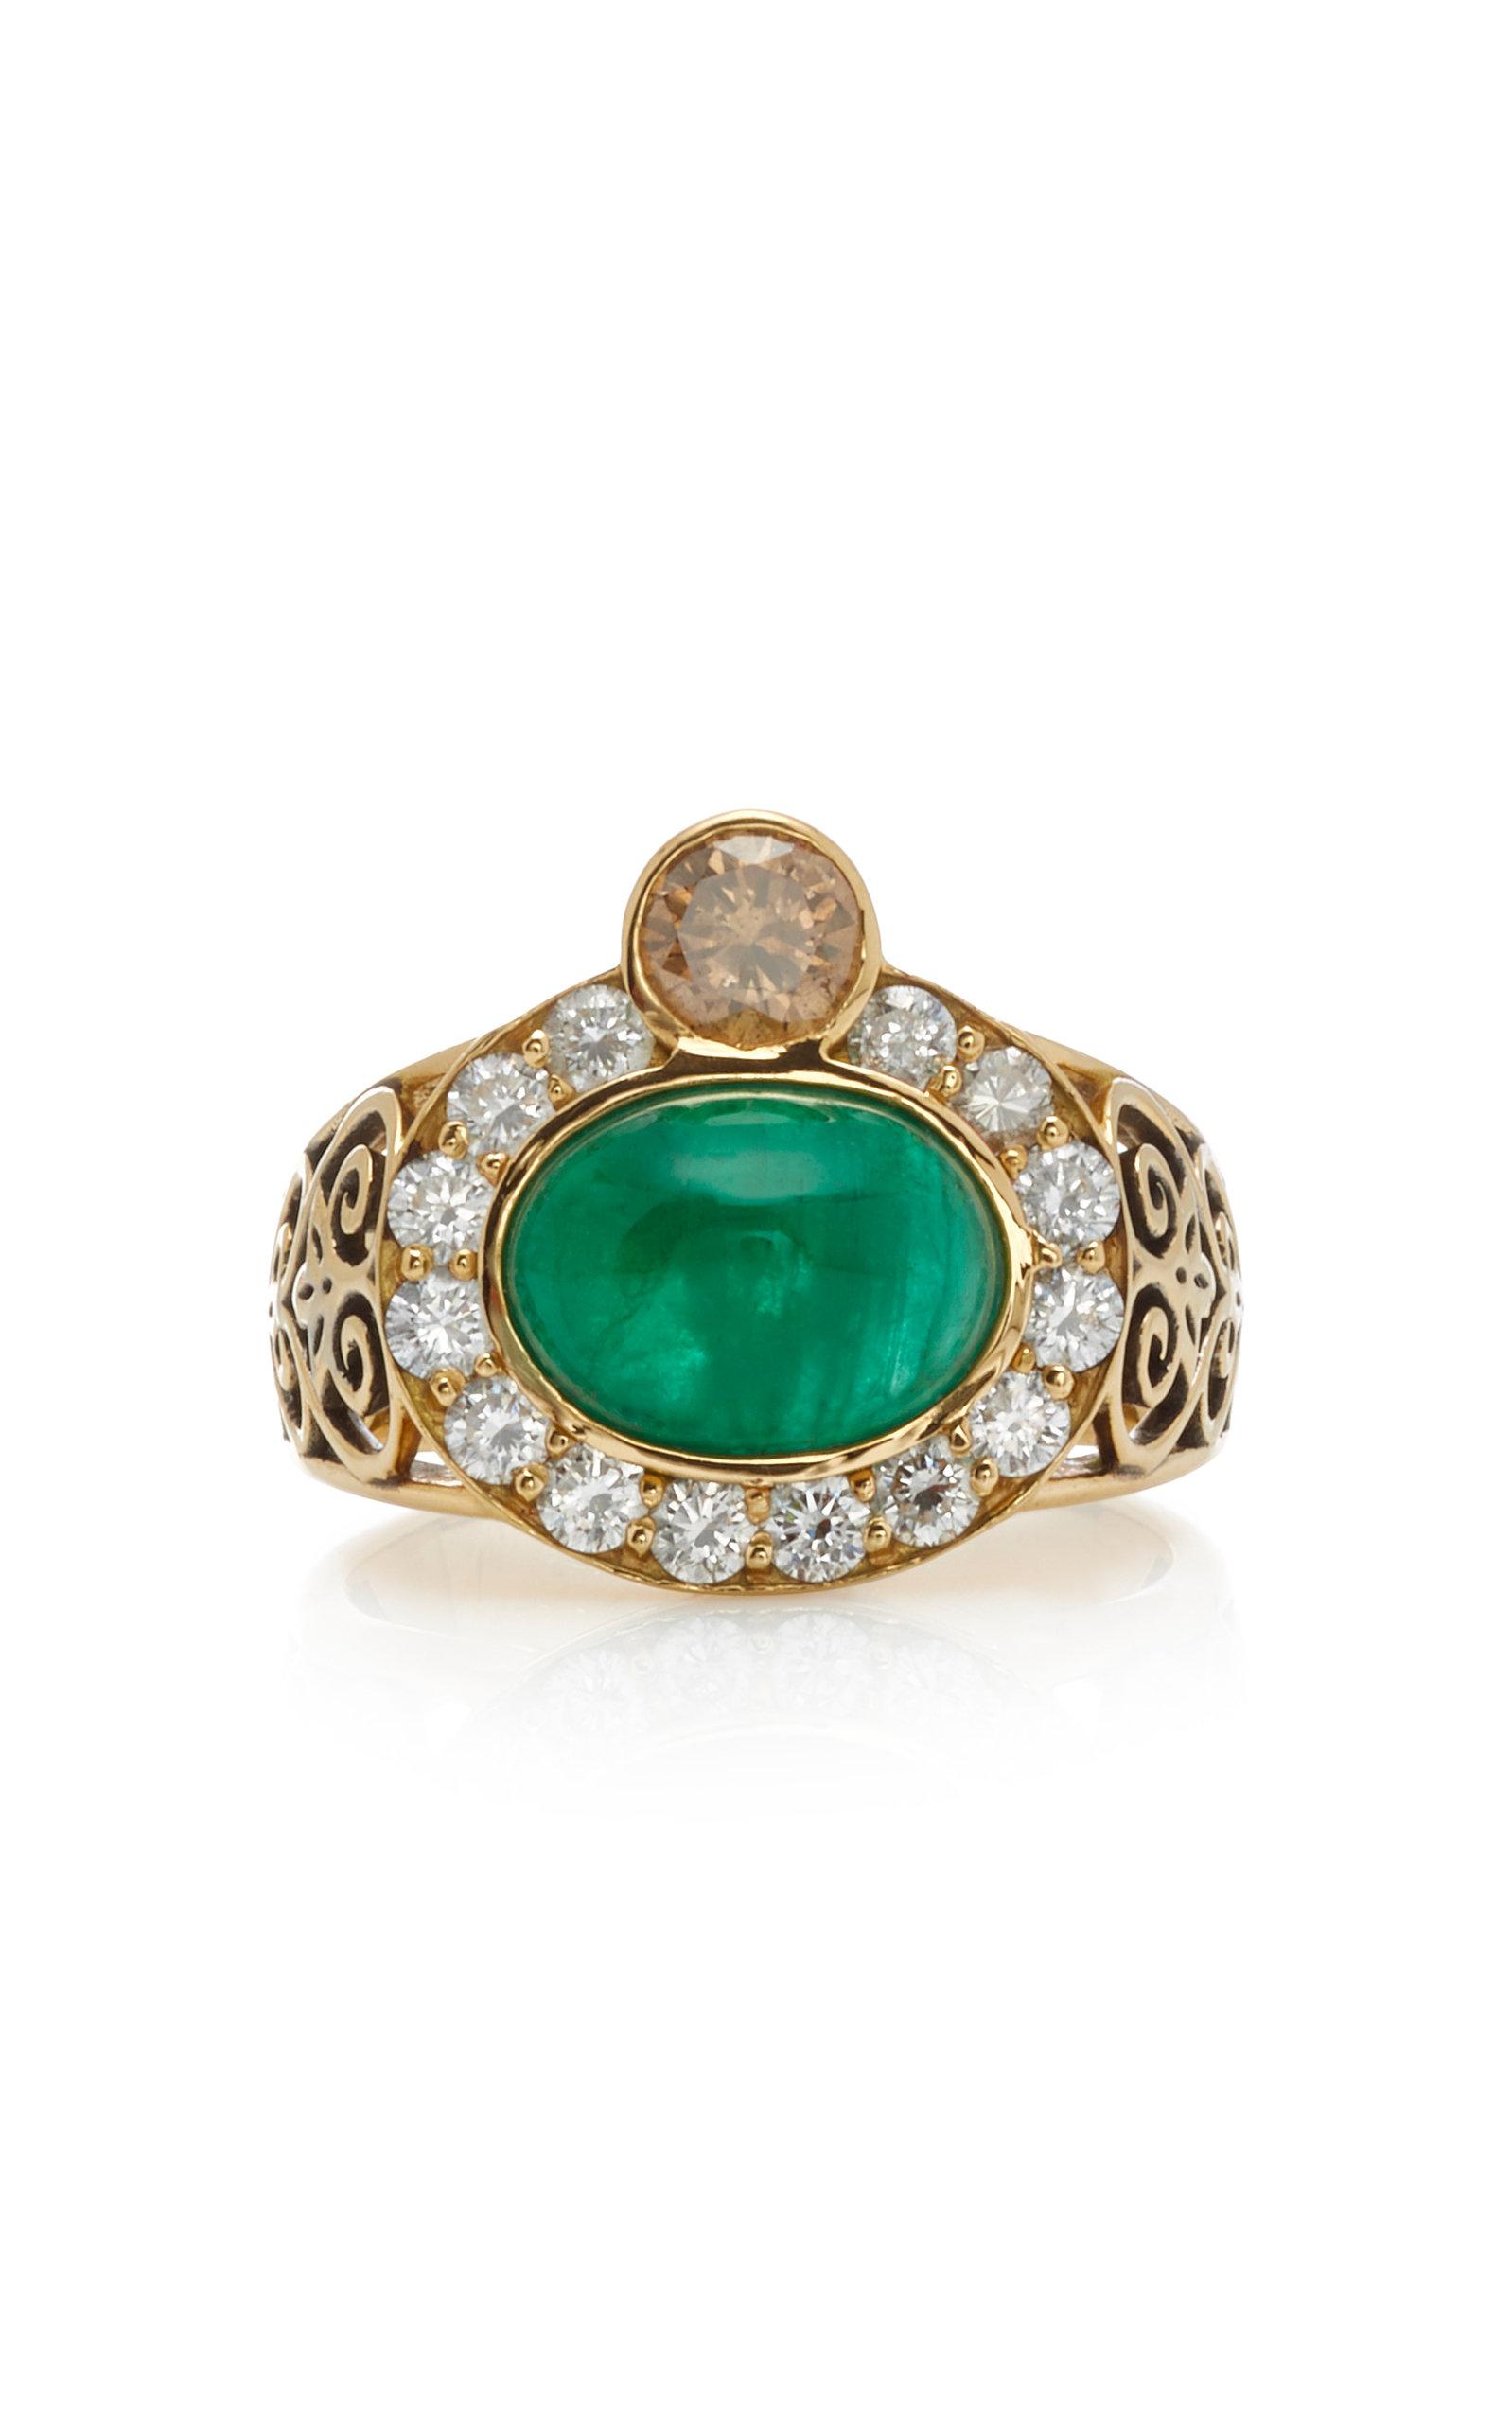 Women's Composure 18K Gold; Emerald and Diamond Ring